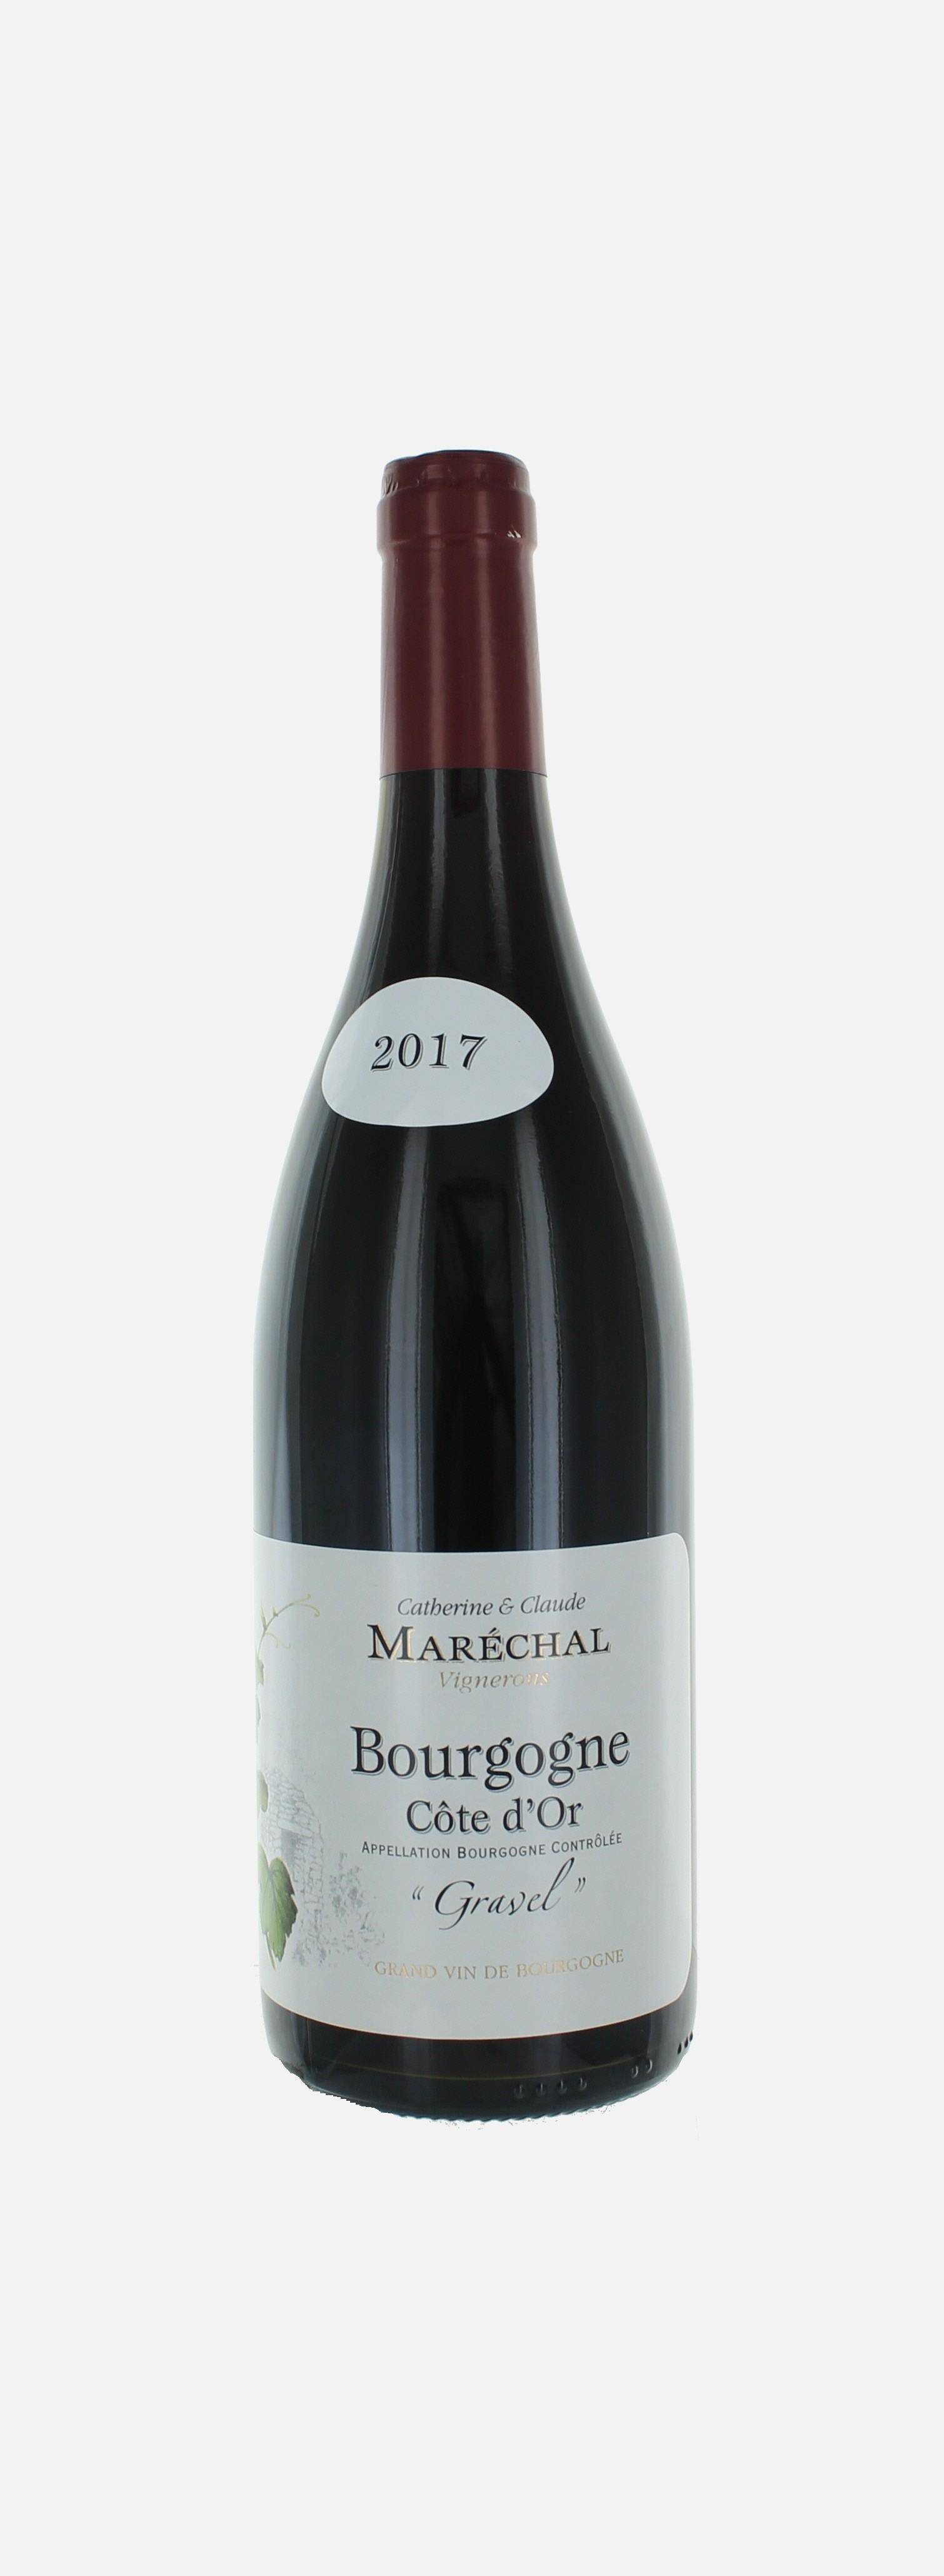 Gravel, Bourgogne, Catherine et Claude Marechal